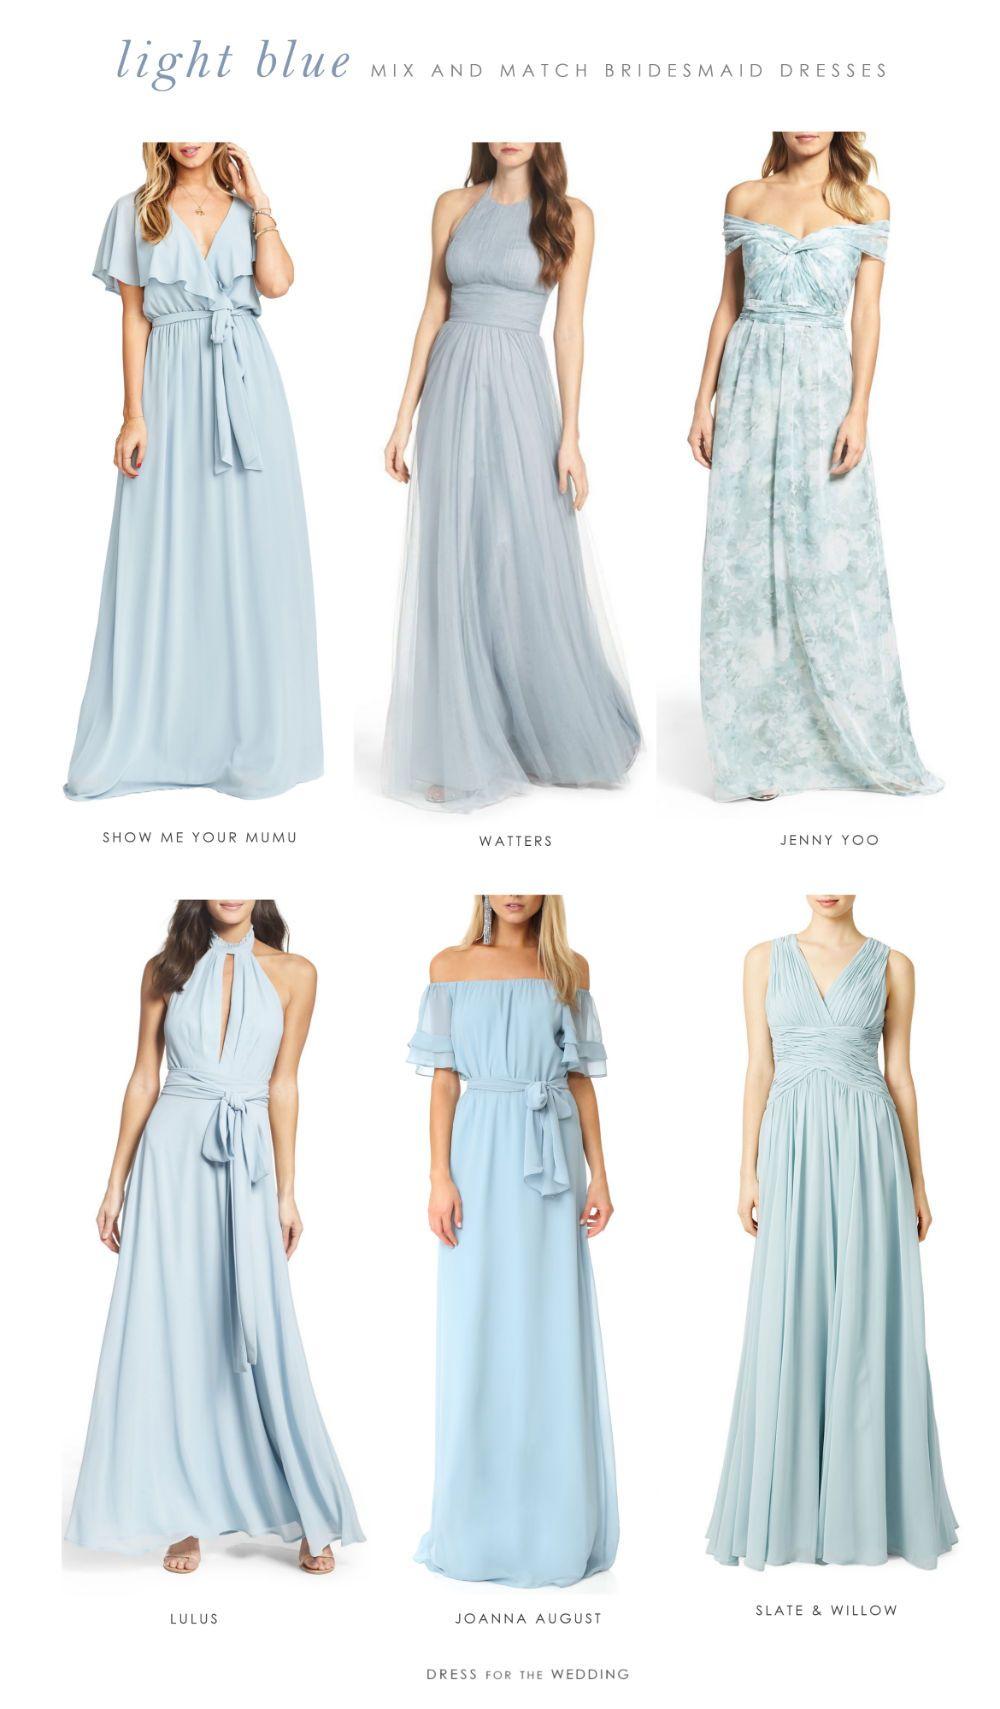 Light blue mix and match bridesmaid dresses wedding weddings and